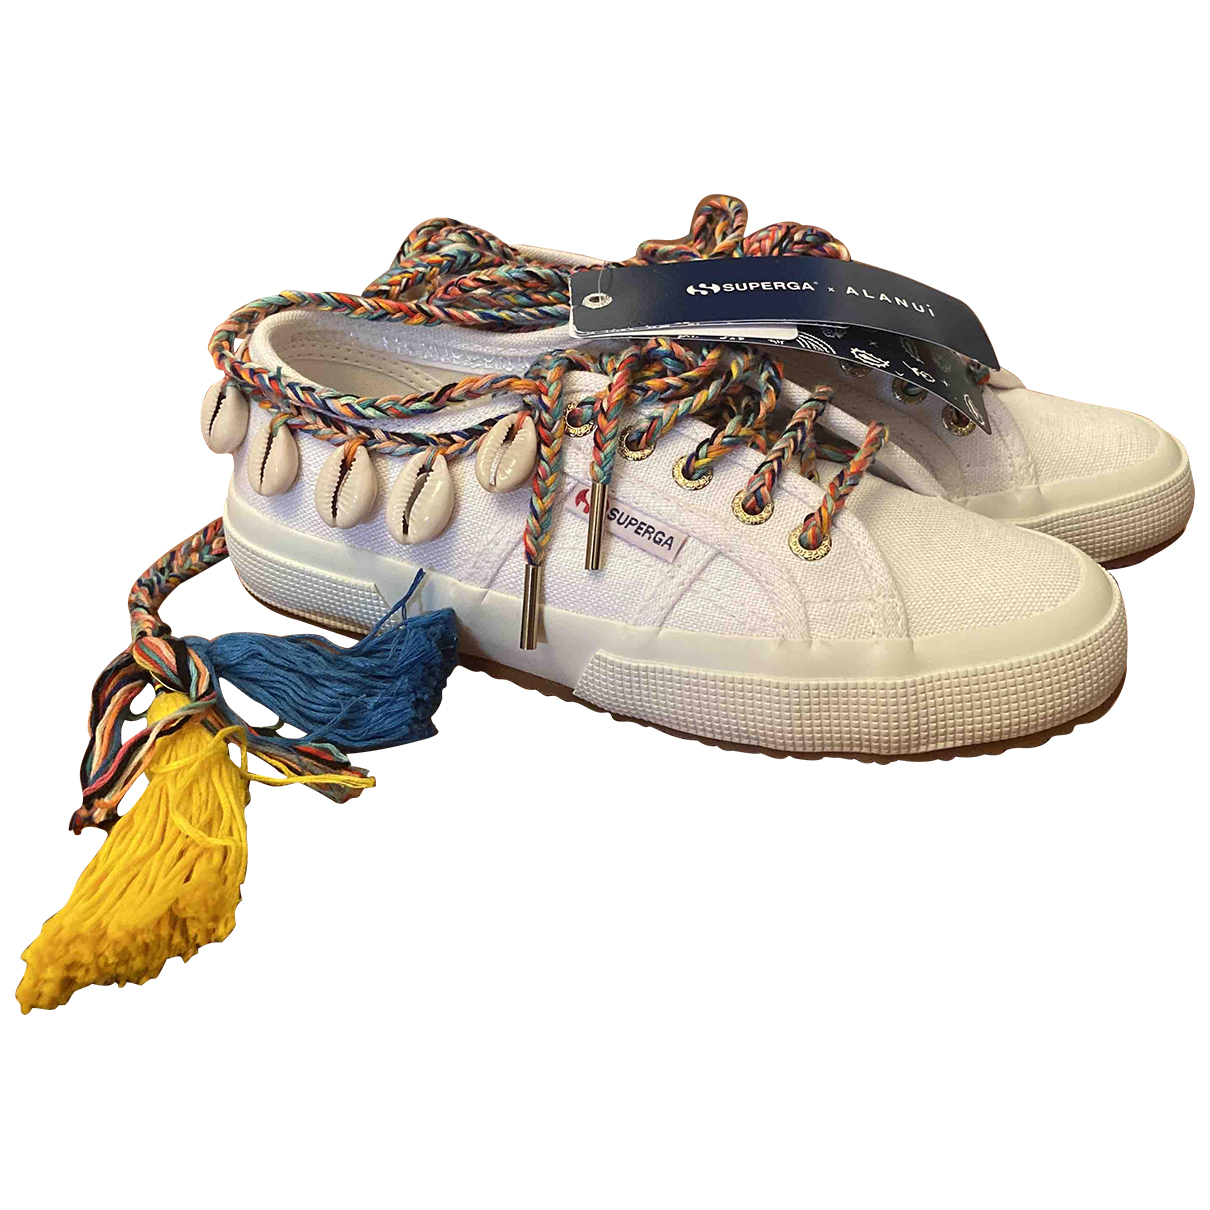 Alanui \N Sneakers in  Weiss Leinen